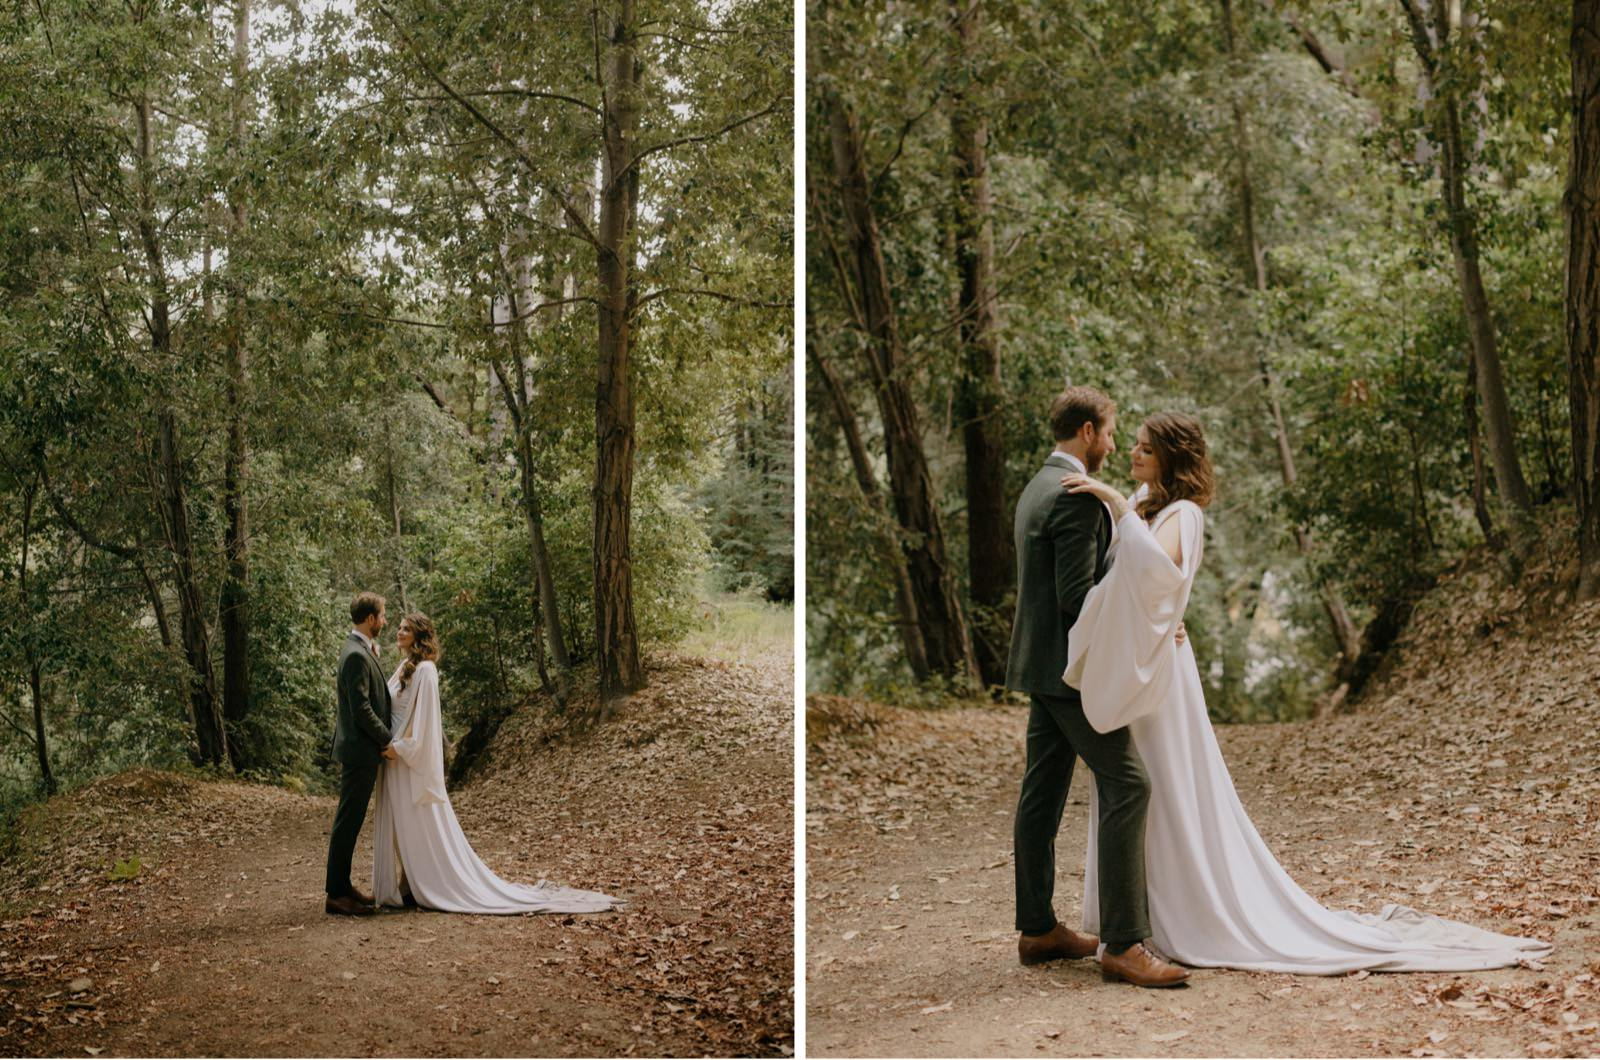 097_E&J 01556_E&J 04461_the-waterfall-lodge_forest_wedding_ben-lomond_intimate